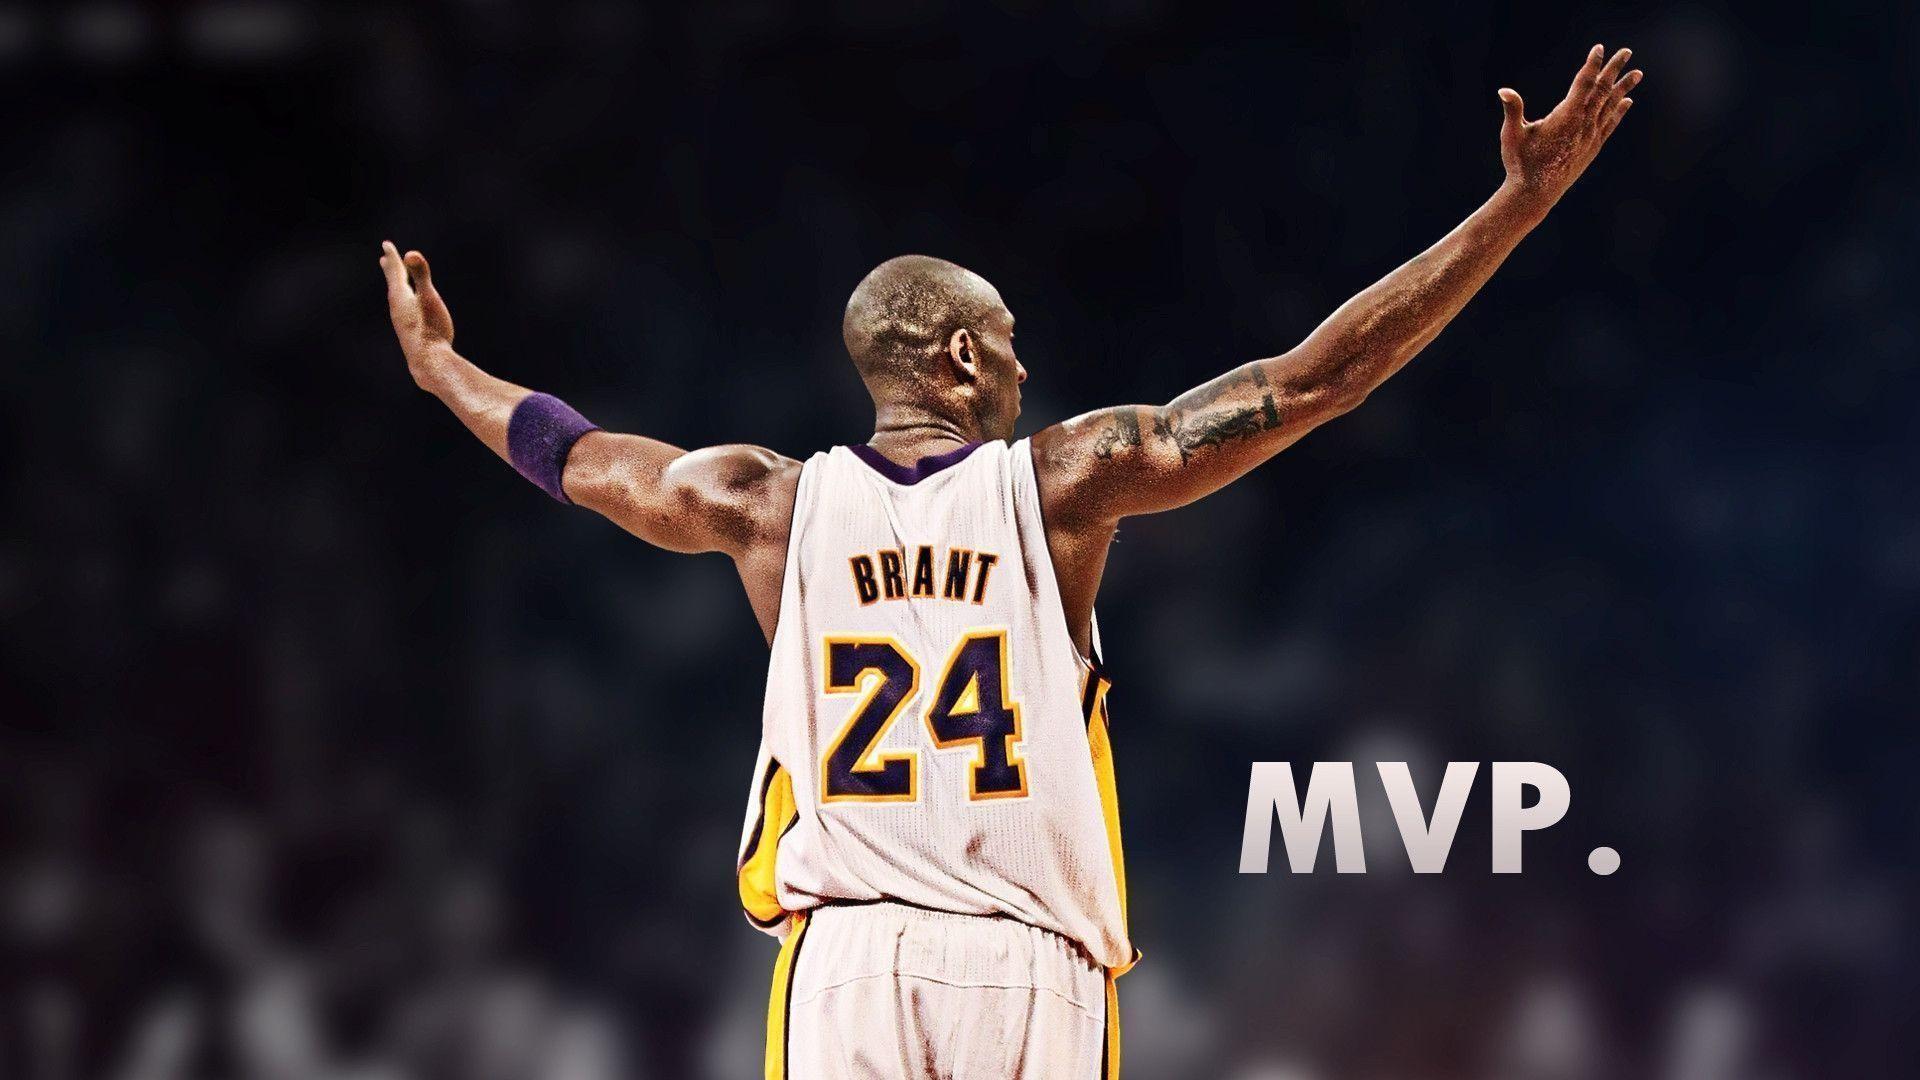 Kobe Bryant MVP Wallpapers HD, Wallpaper, Kobe Bryant MVP